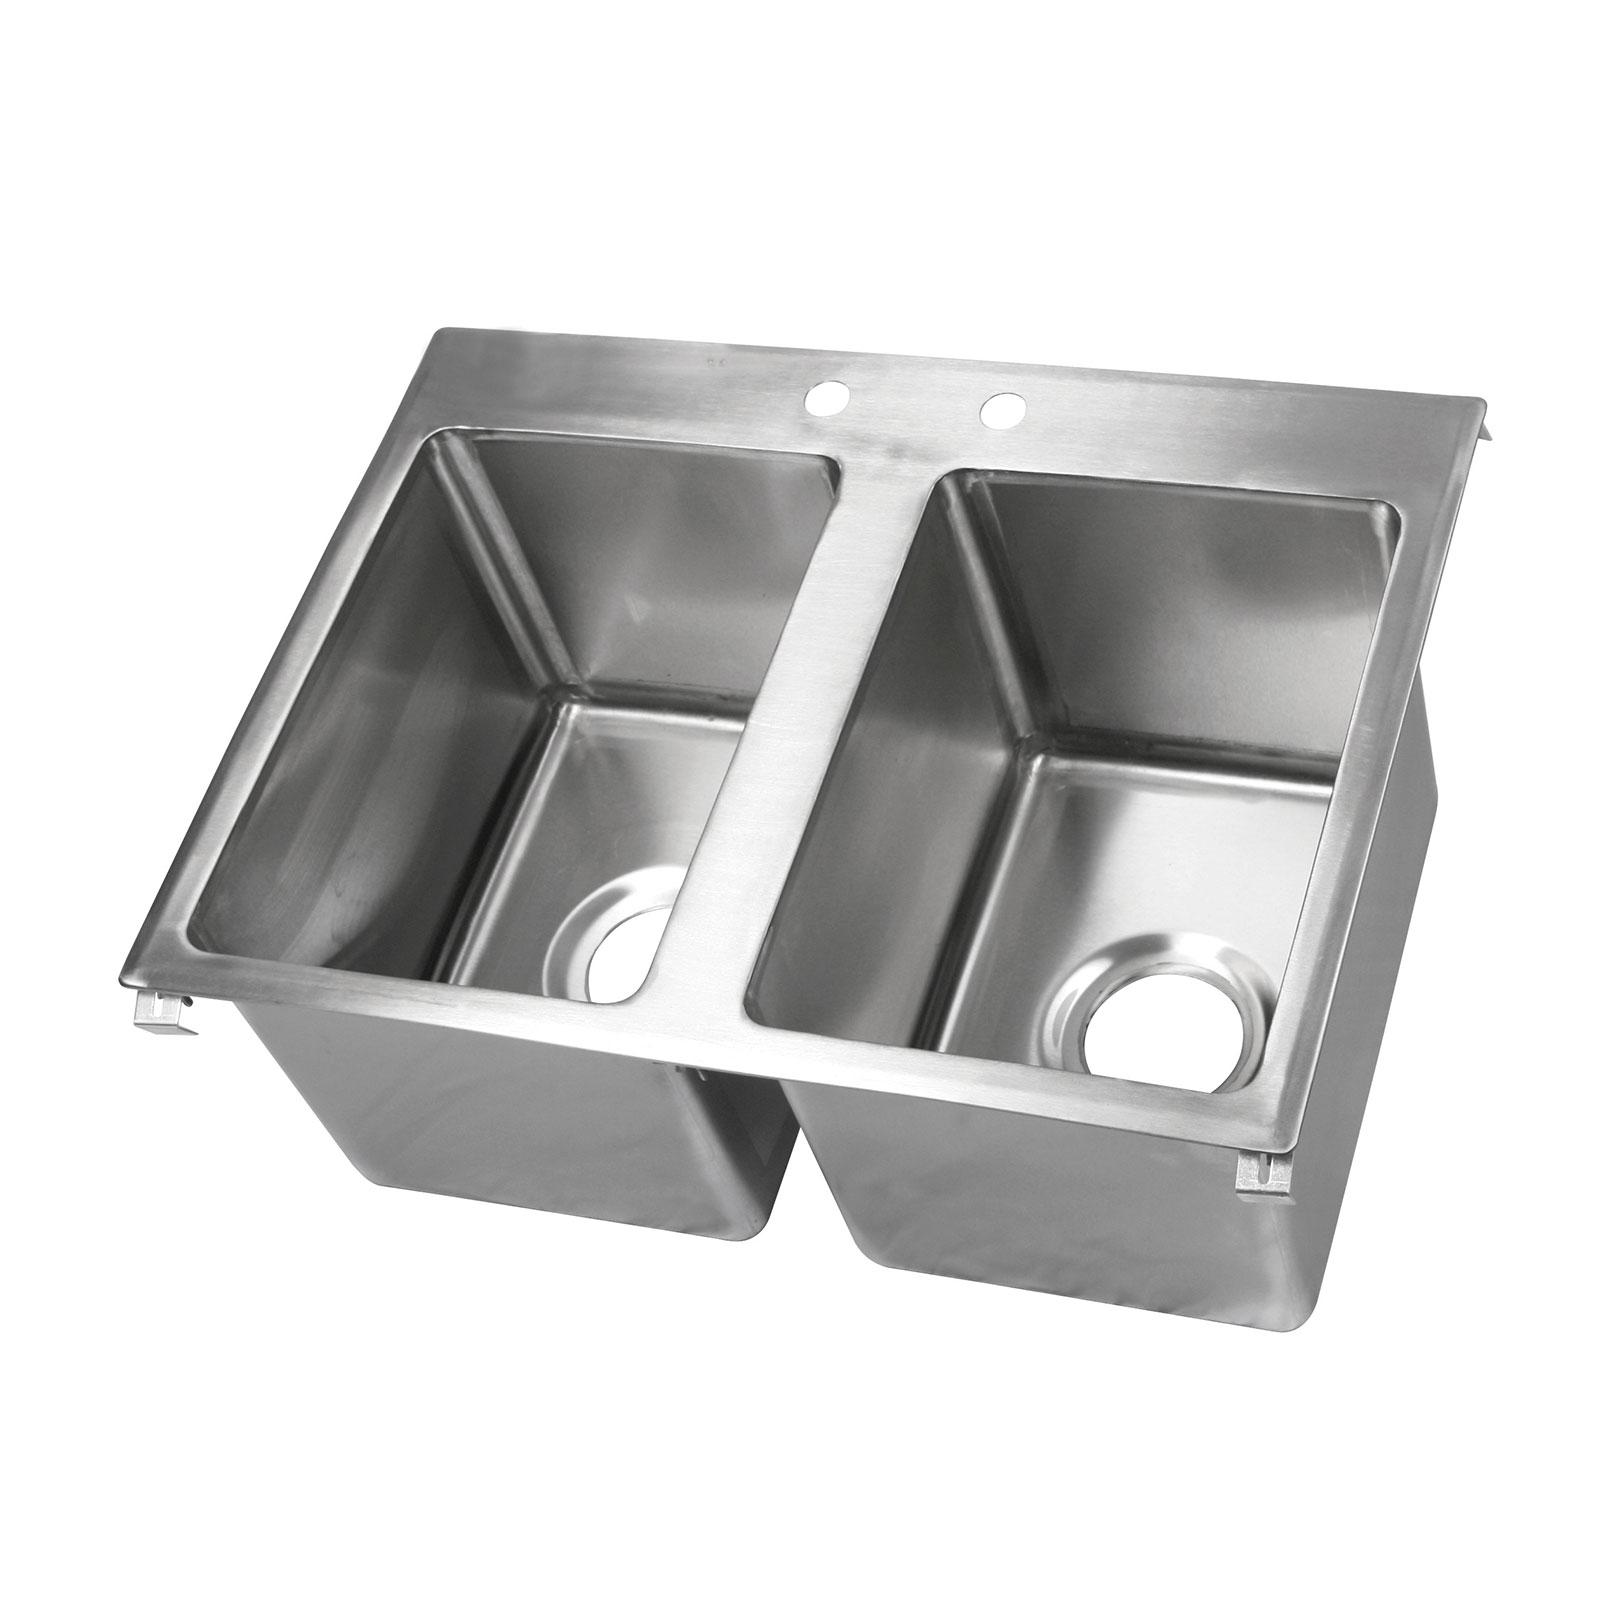 John Boos PB-DISINK141610-2 sink, drop-in